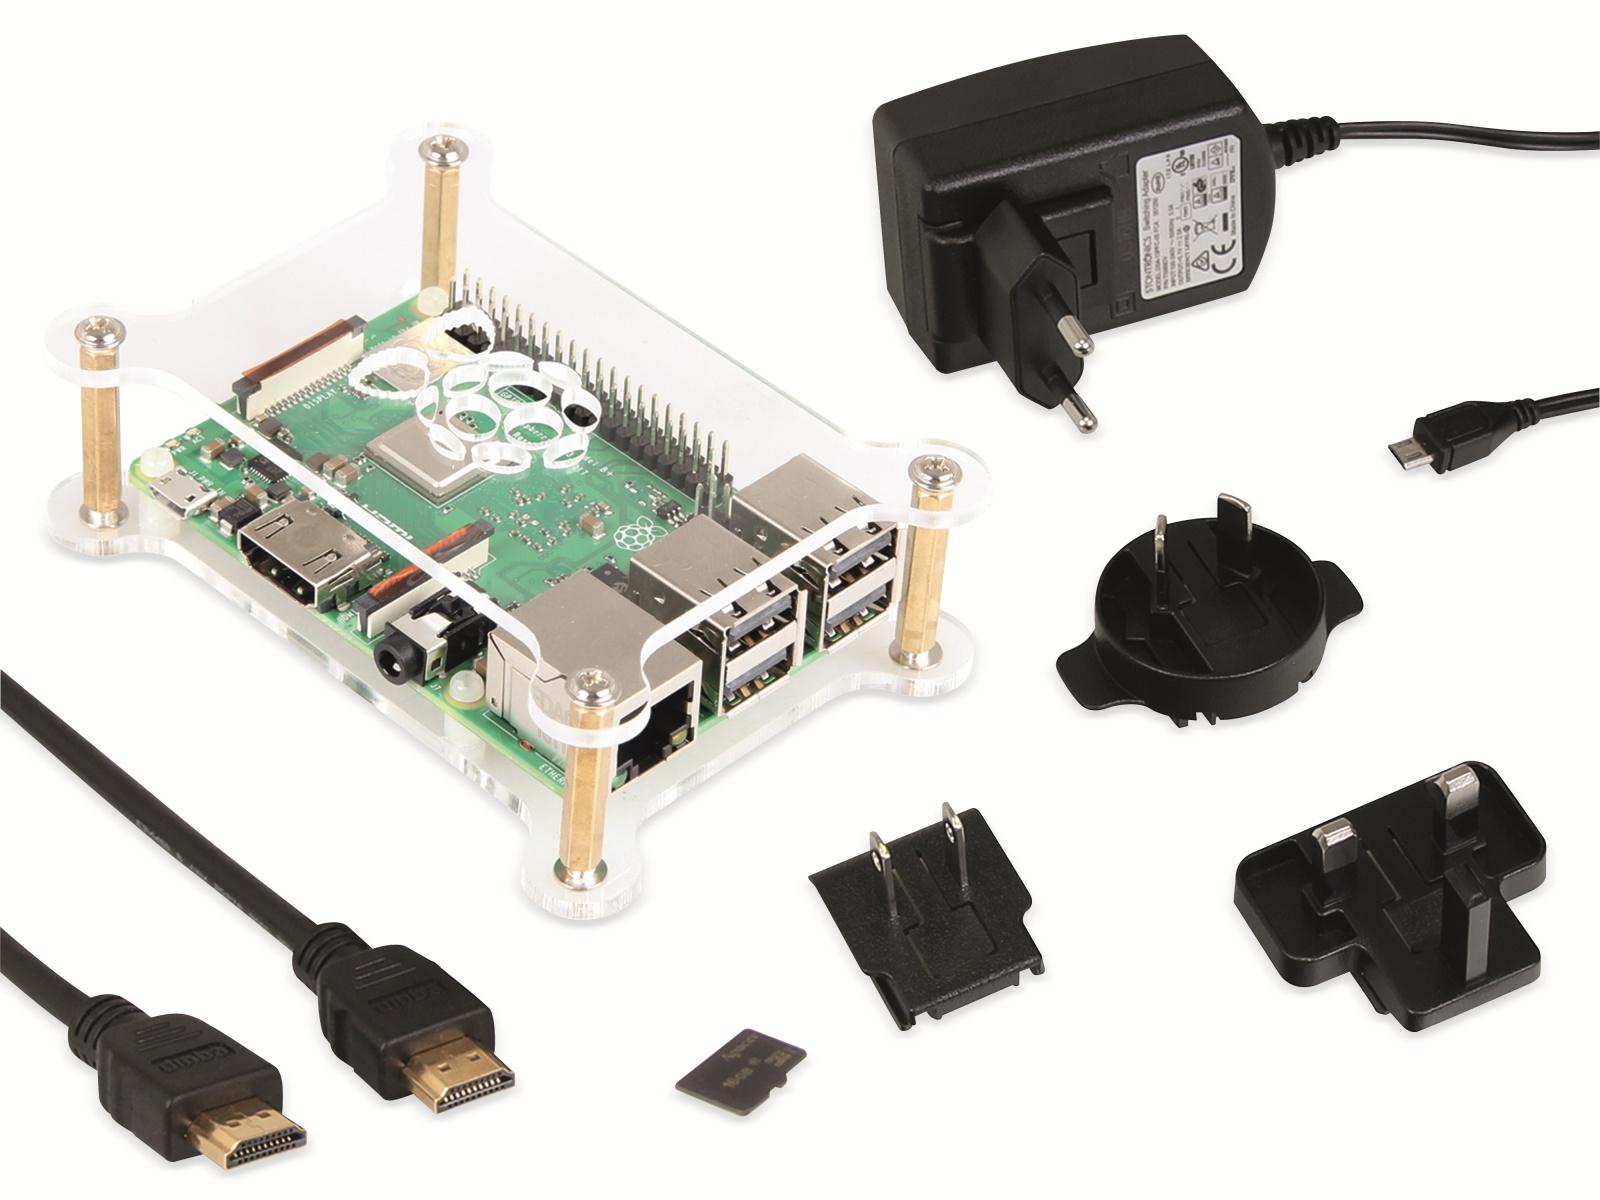 Raspberry Pi 3 Modell B+ Starter-Set (inkl. microSD, Netzteil, Gehäuse, HDMI-Kabel) für 49,98€ [Pollin]